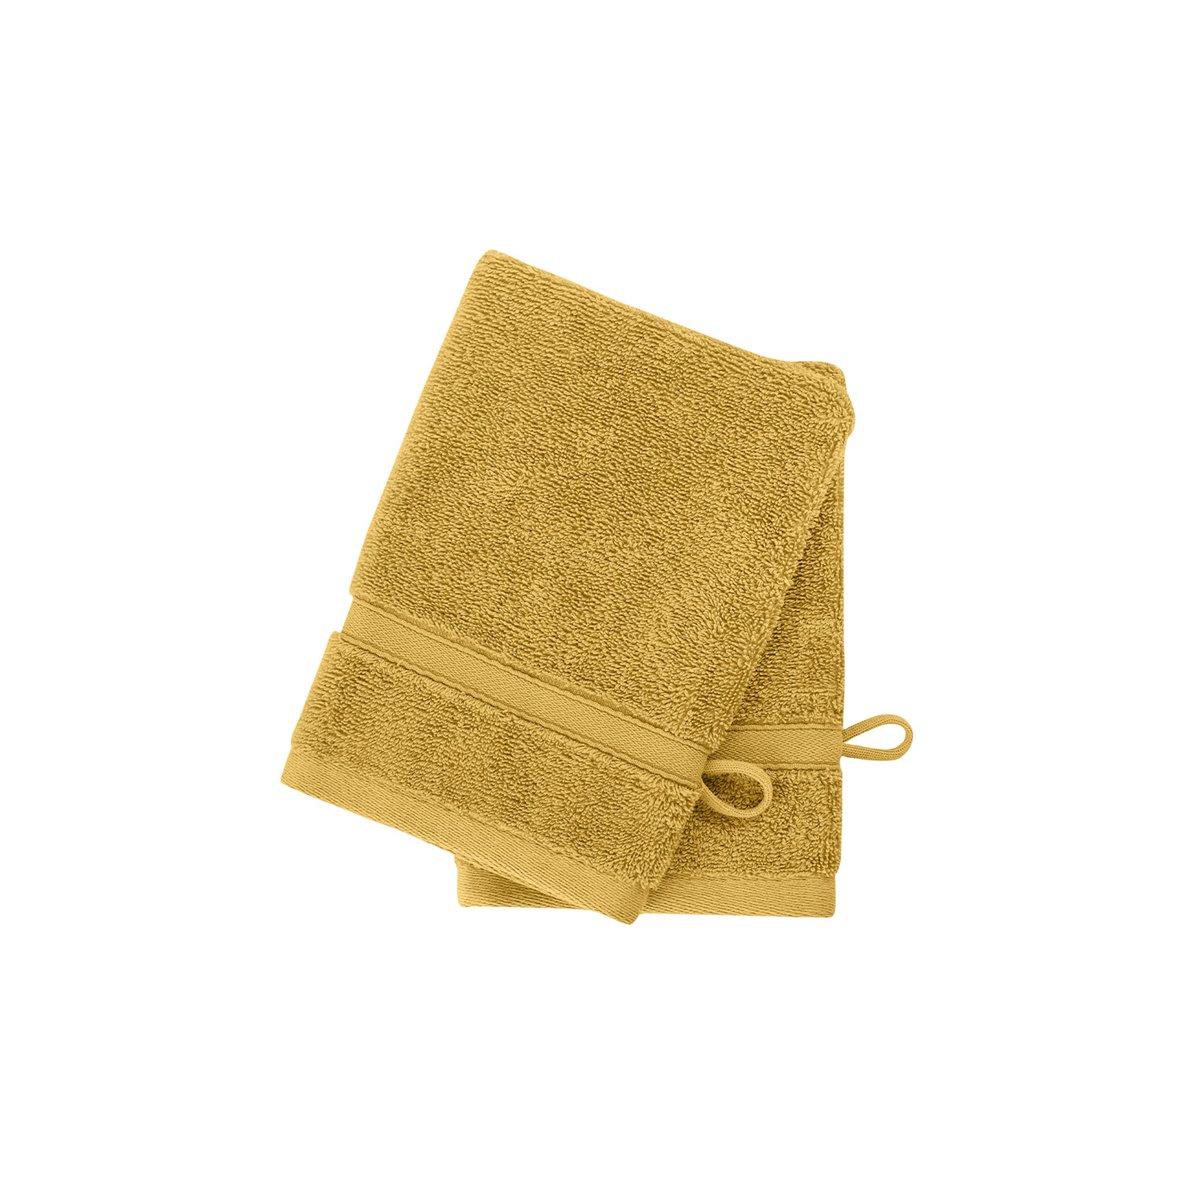 2 gants en coton bio Miel 16x22 cm